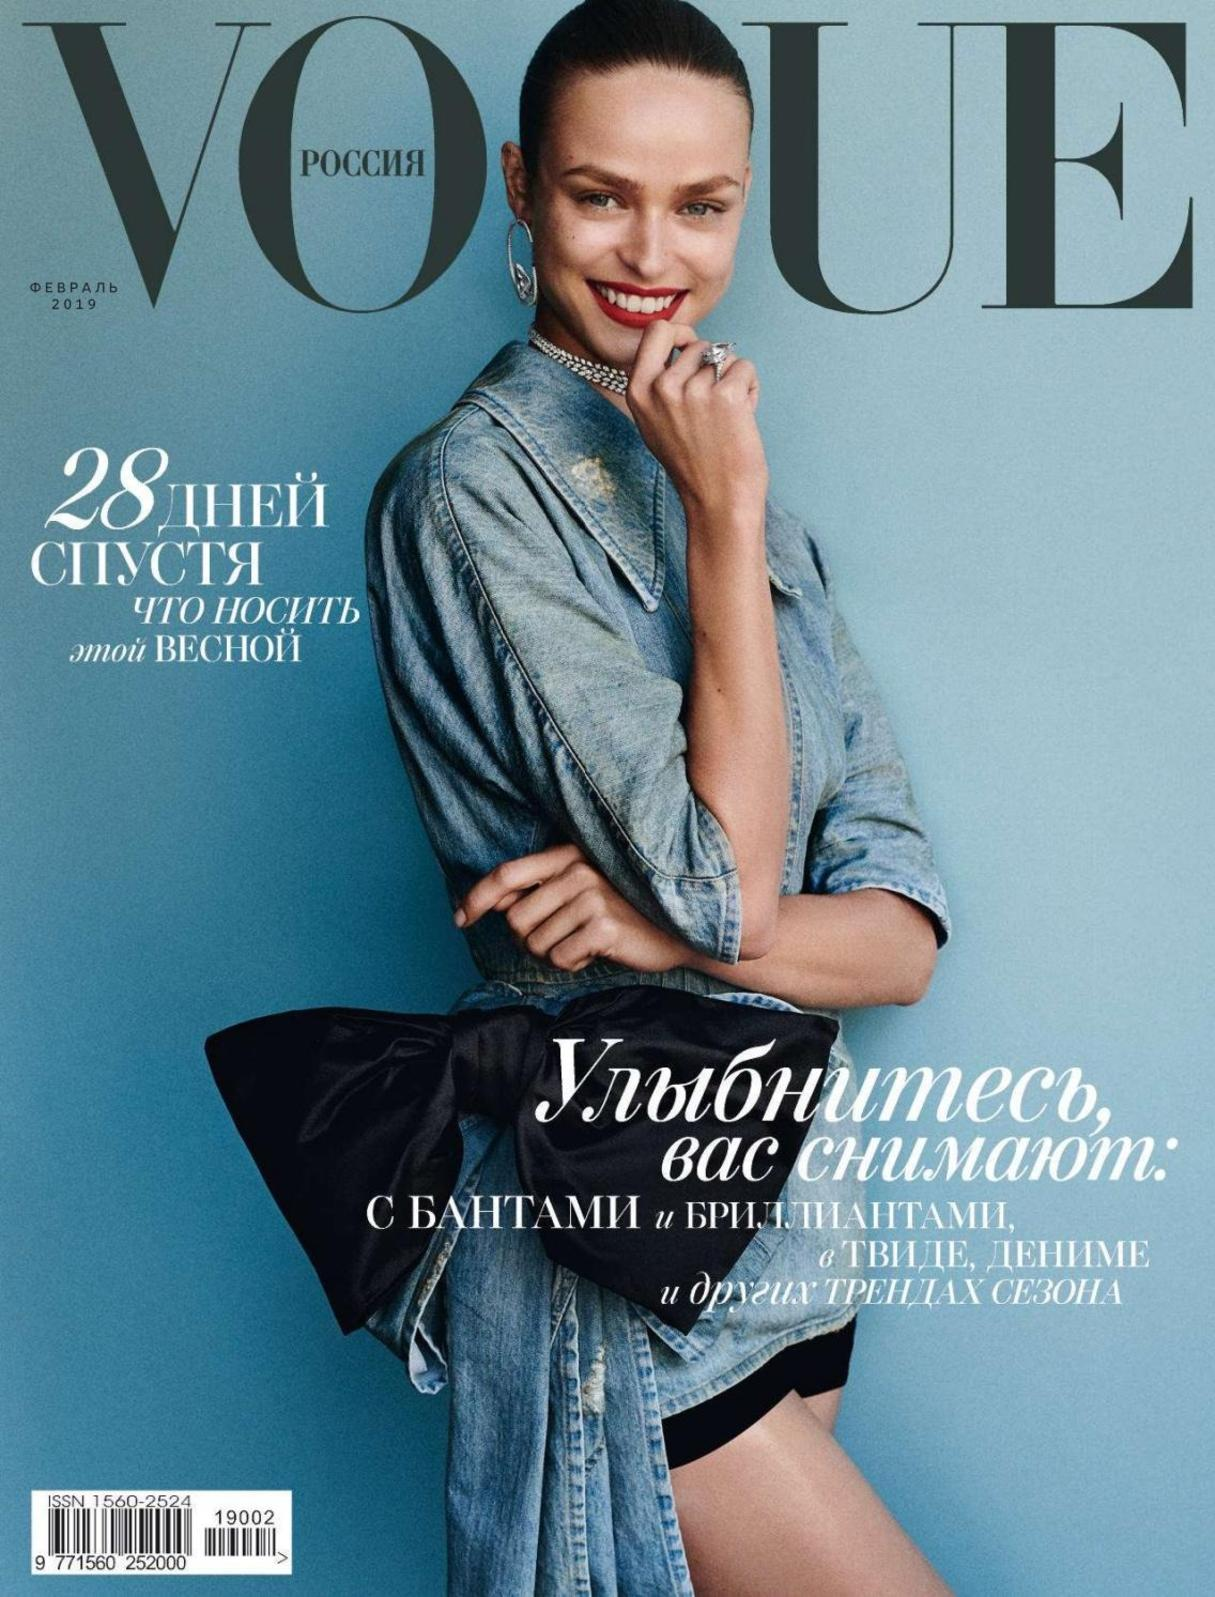 Vogue022019